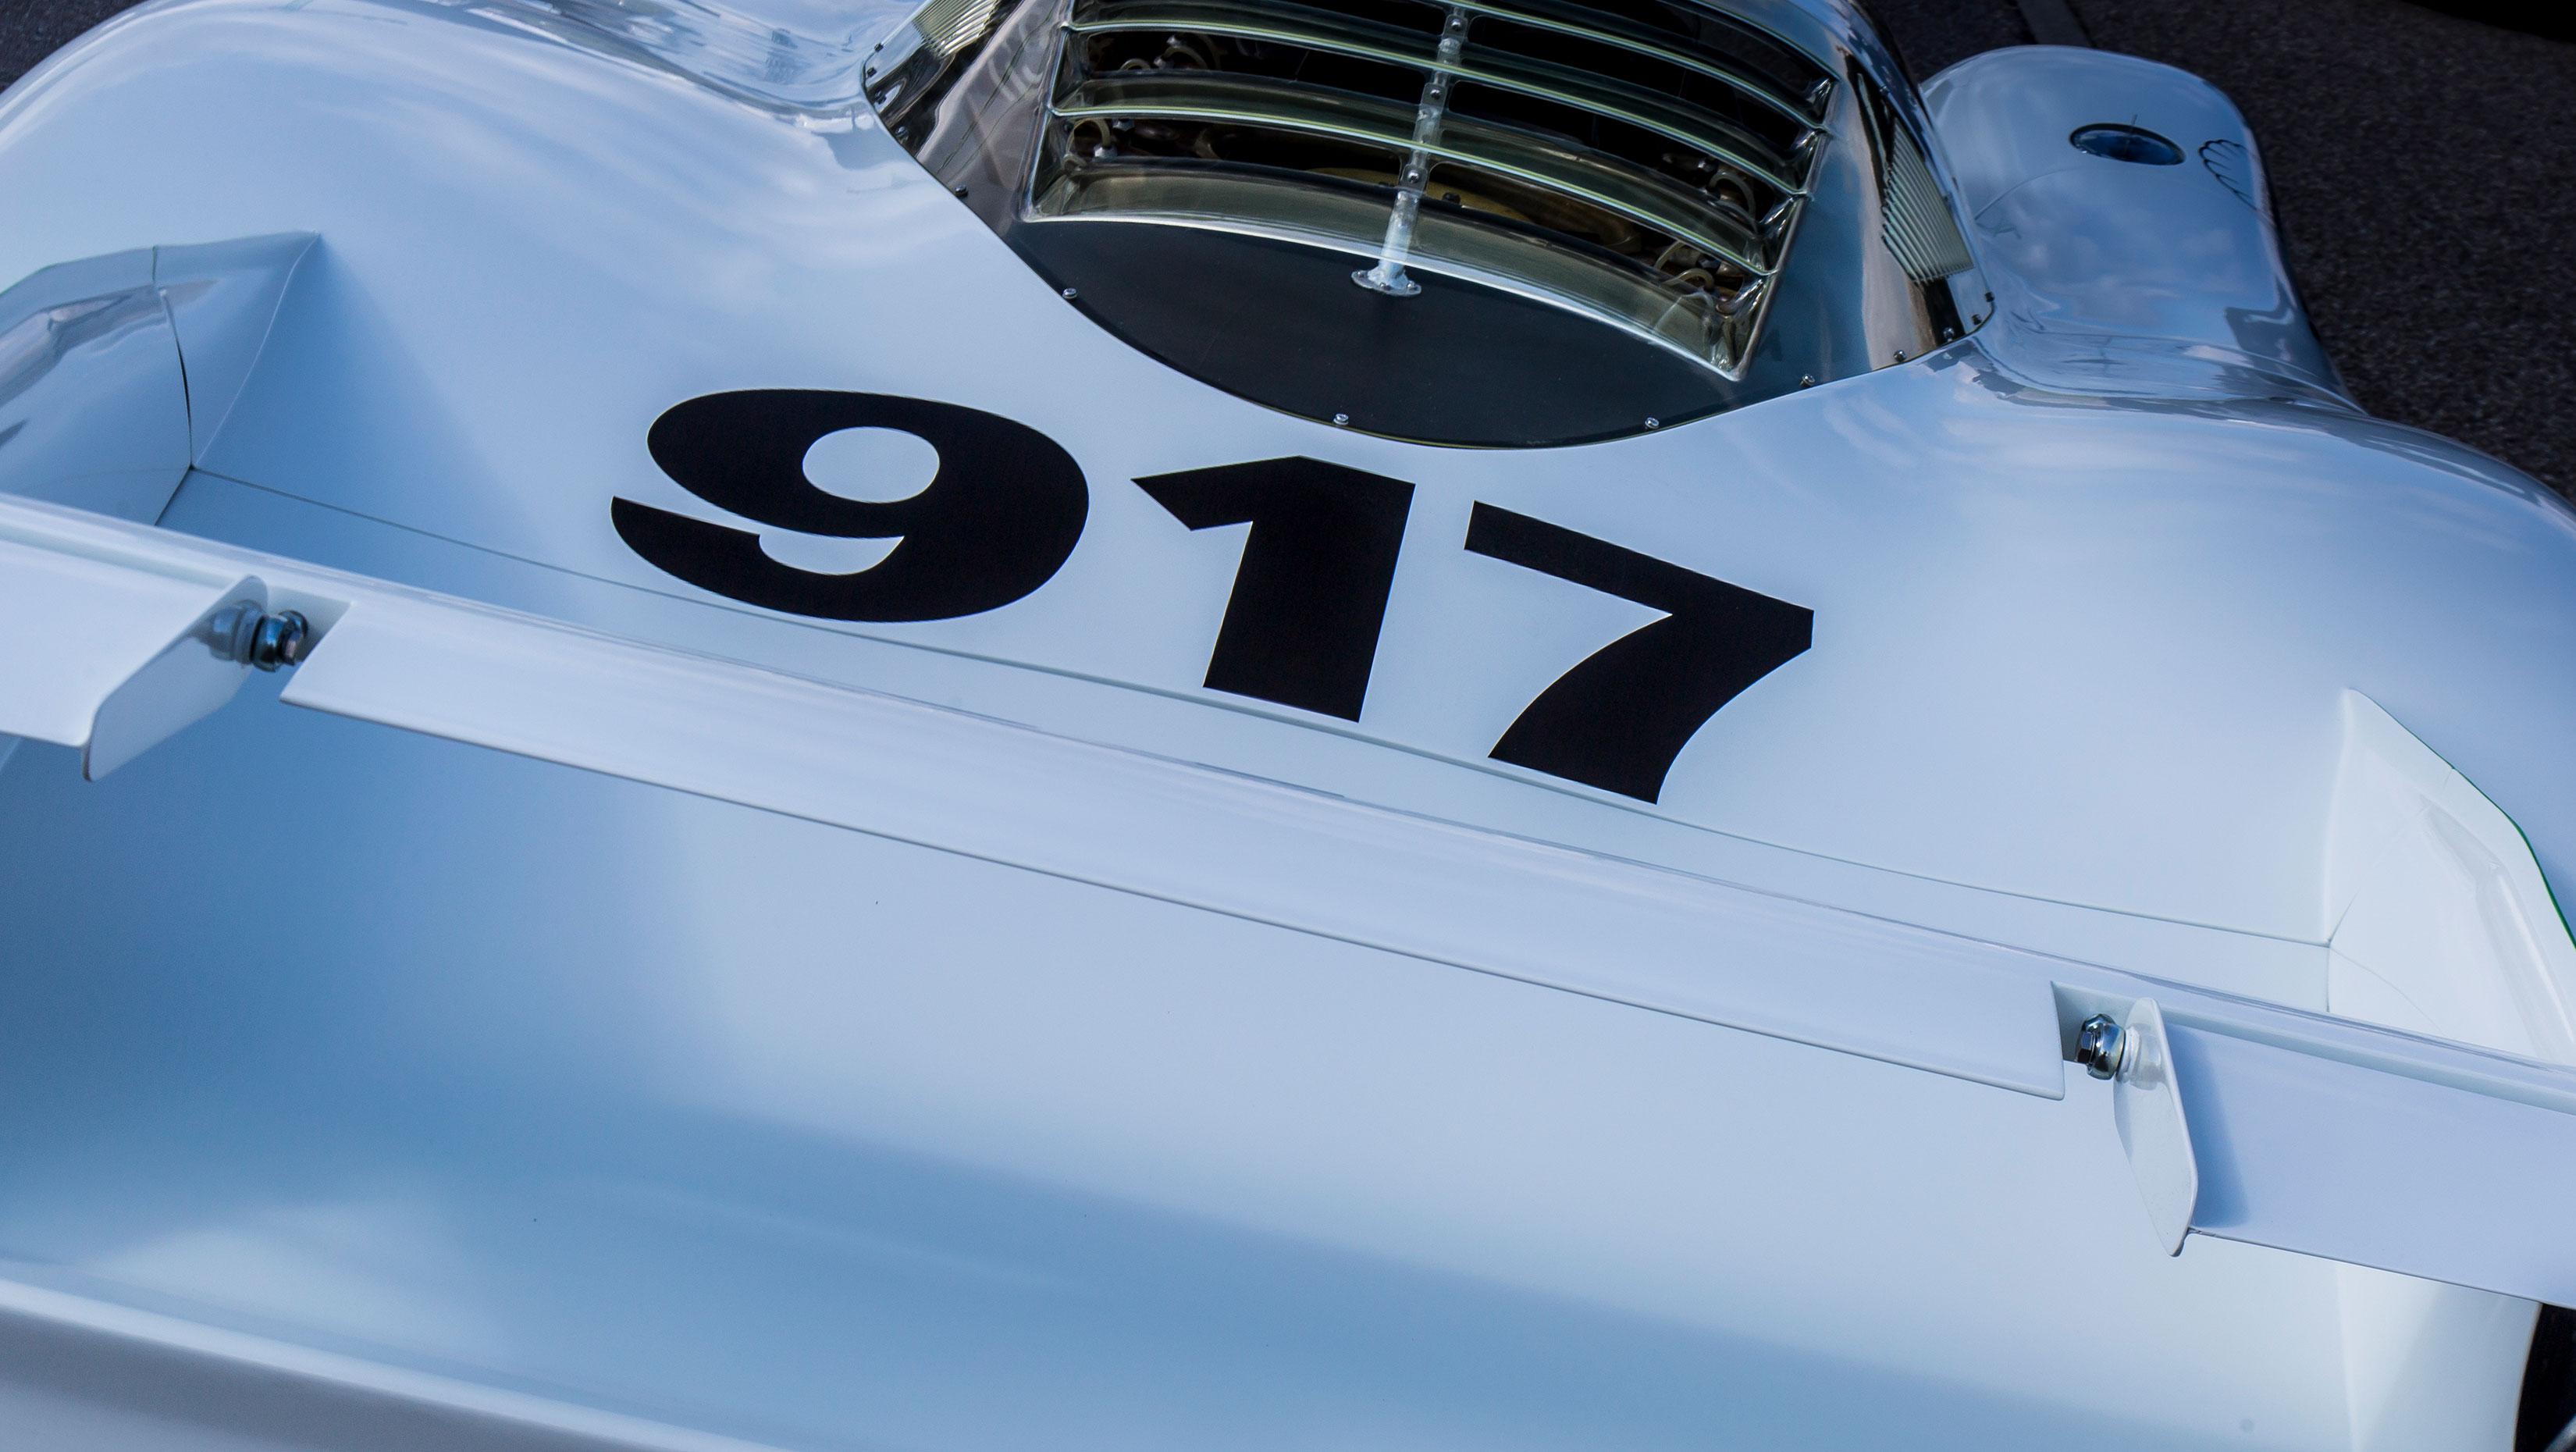 Porsche 917 paint